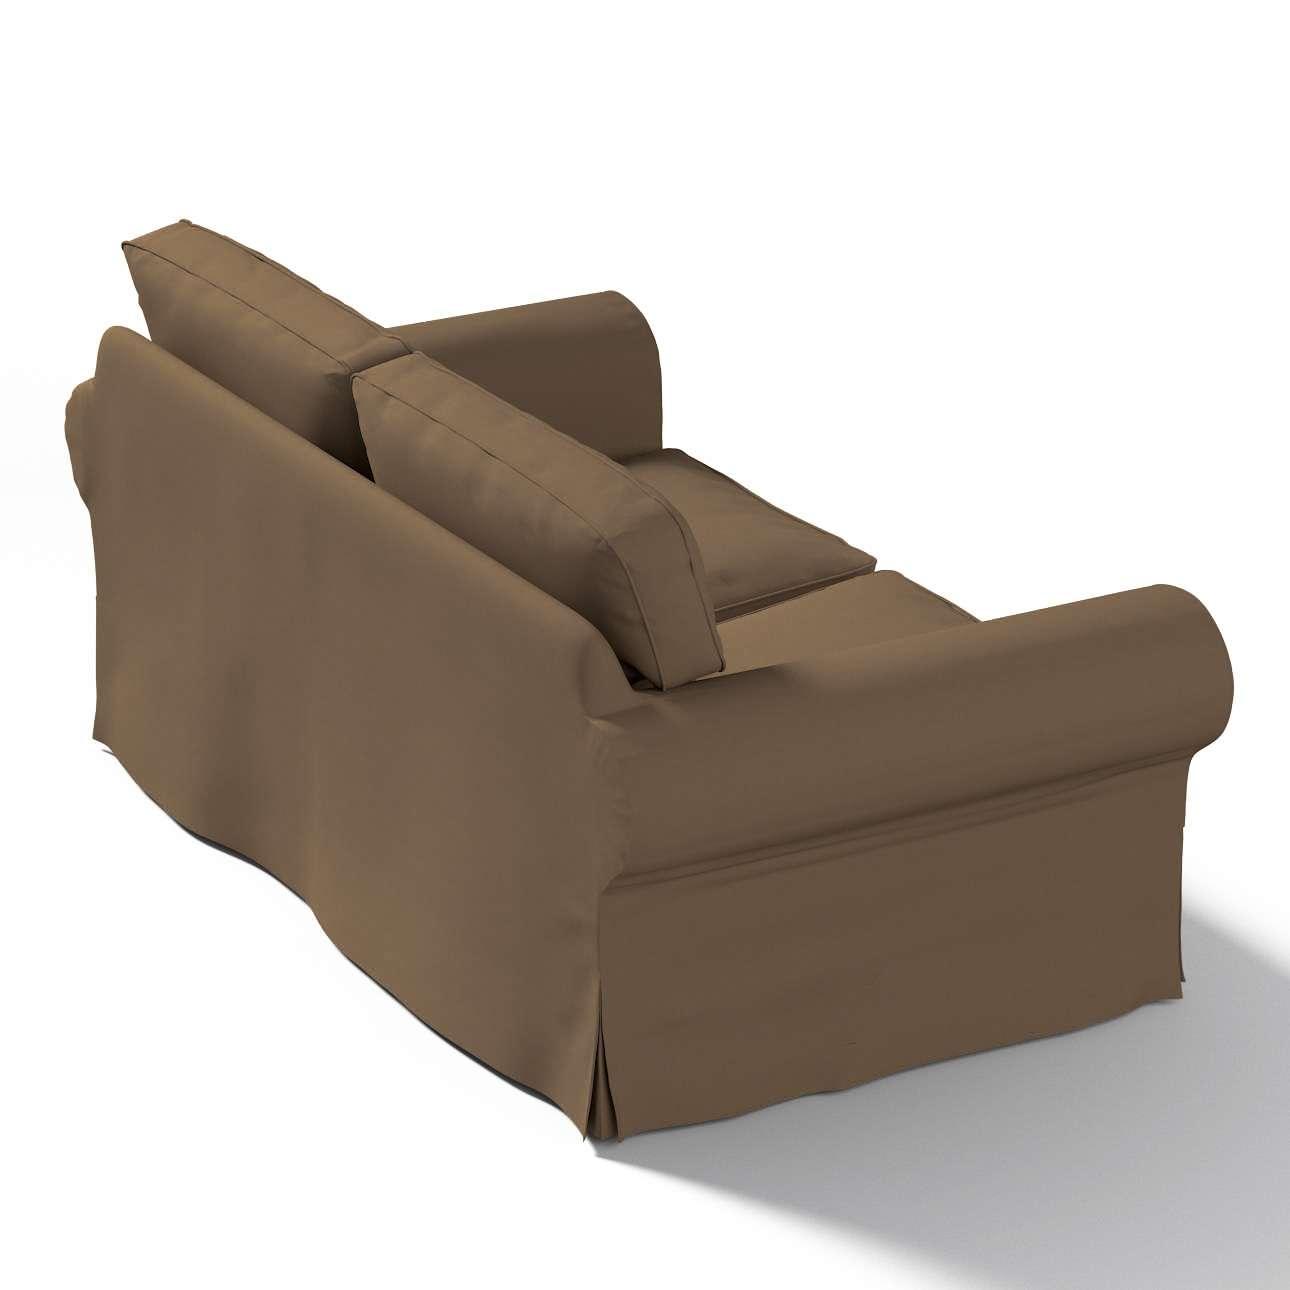 Ektorp 2-Sitzer Schlafsofabezug  ALTES Modell Sofabezug Ektorp 2-Sitzer Schlafsofa altes Modell von der Kollektion Cotton Panama, Stoff: 702-02